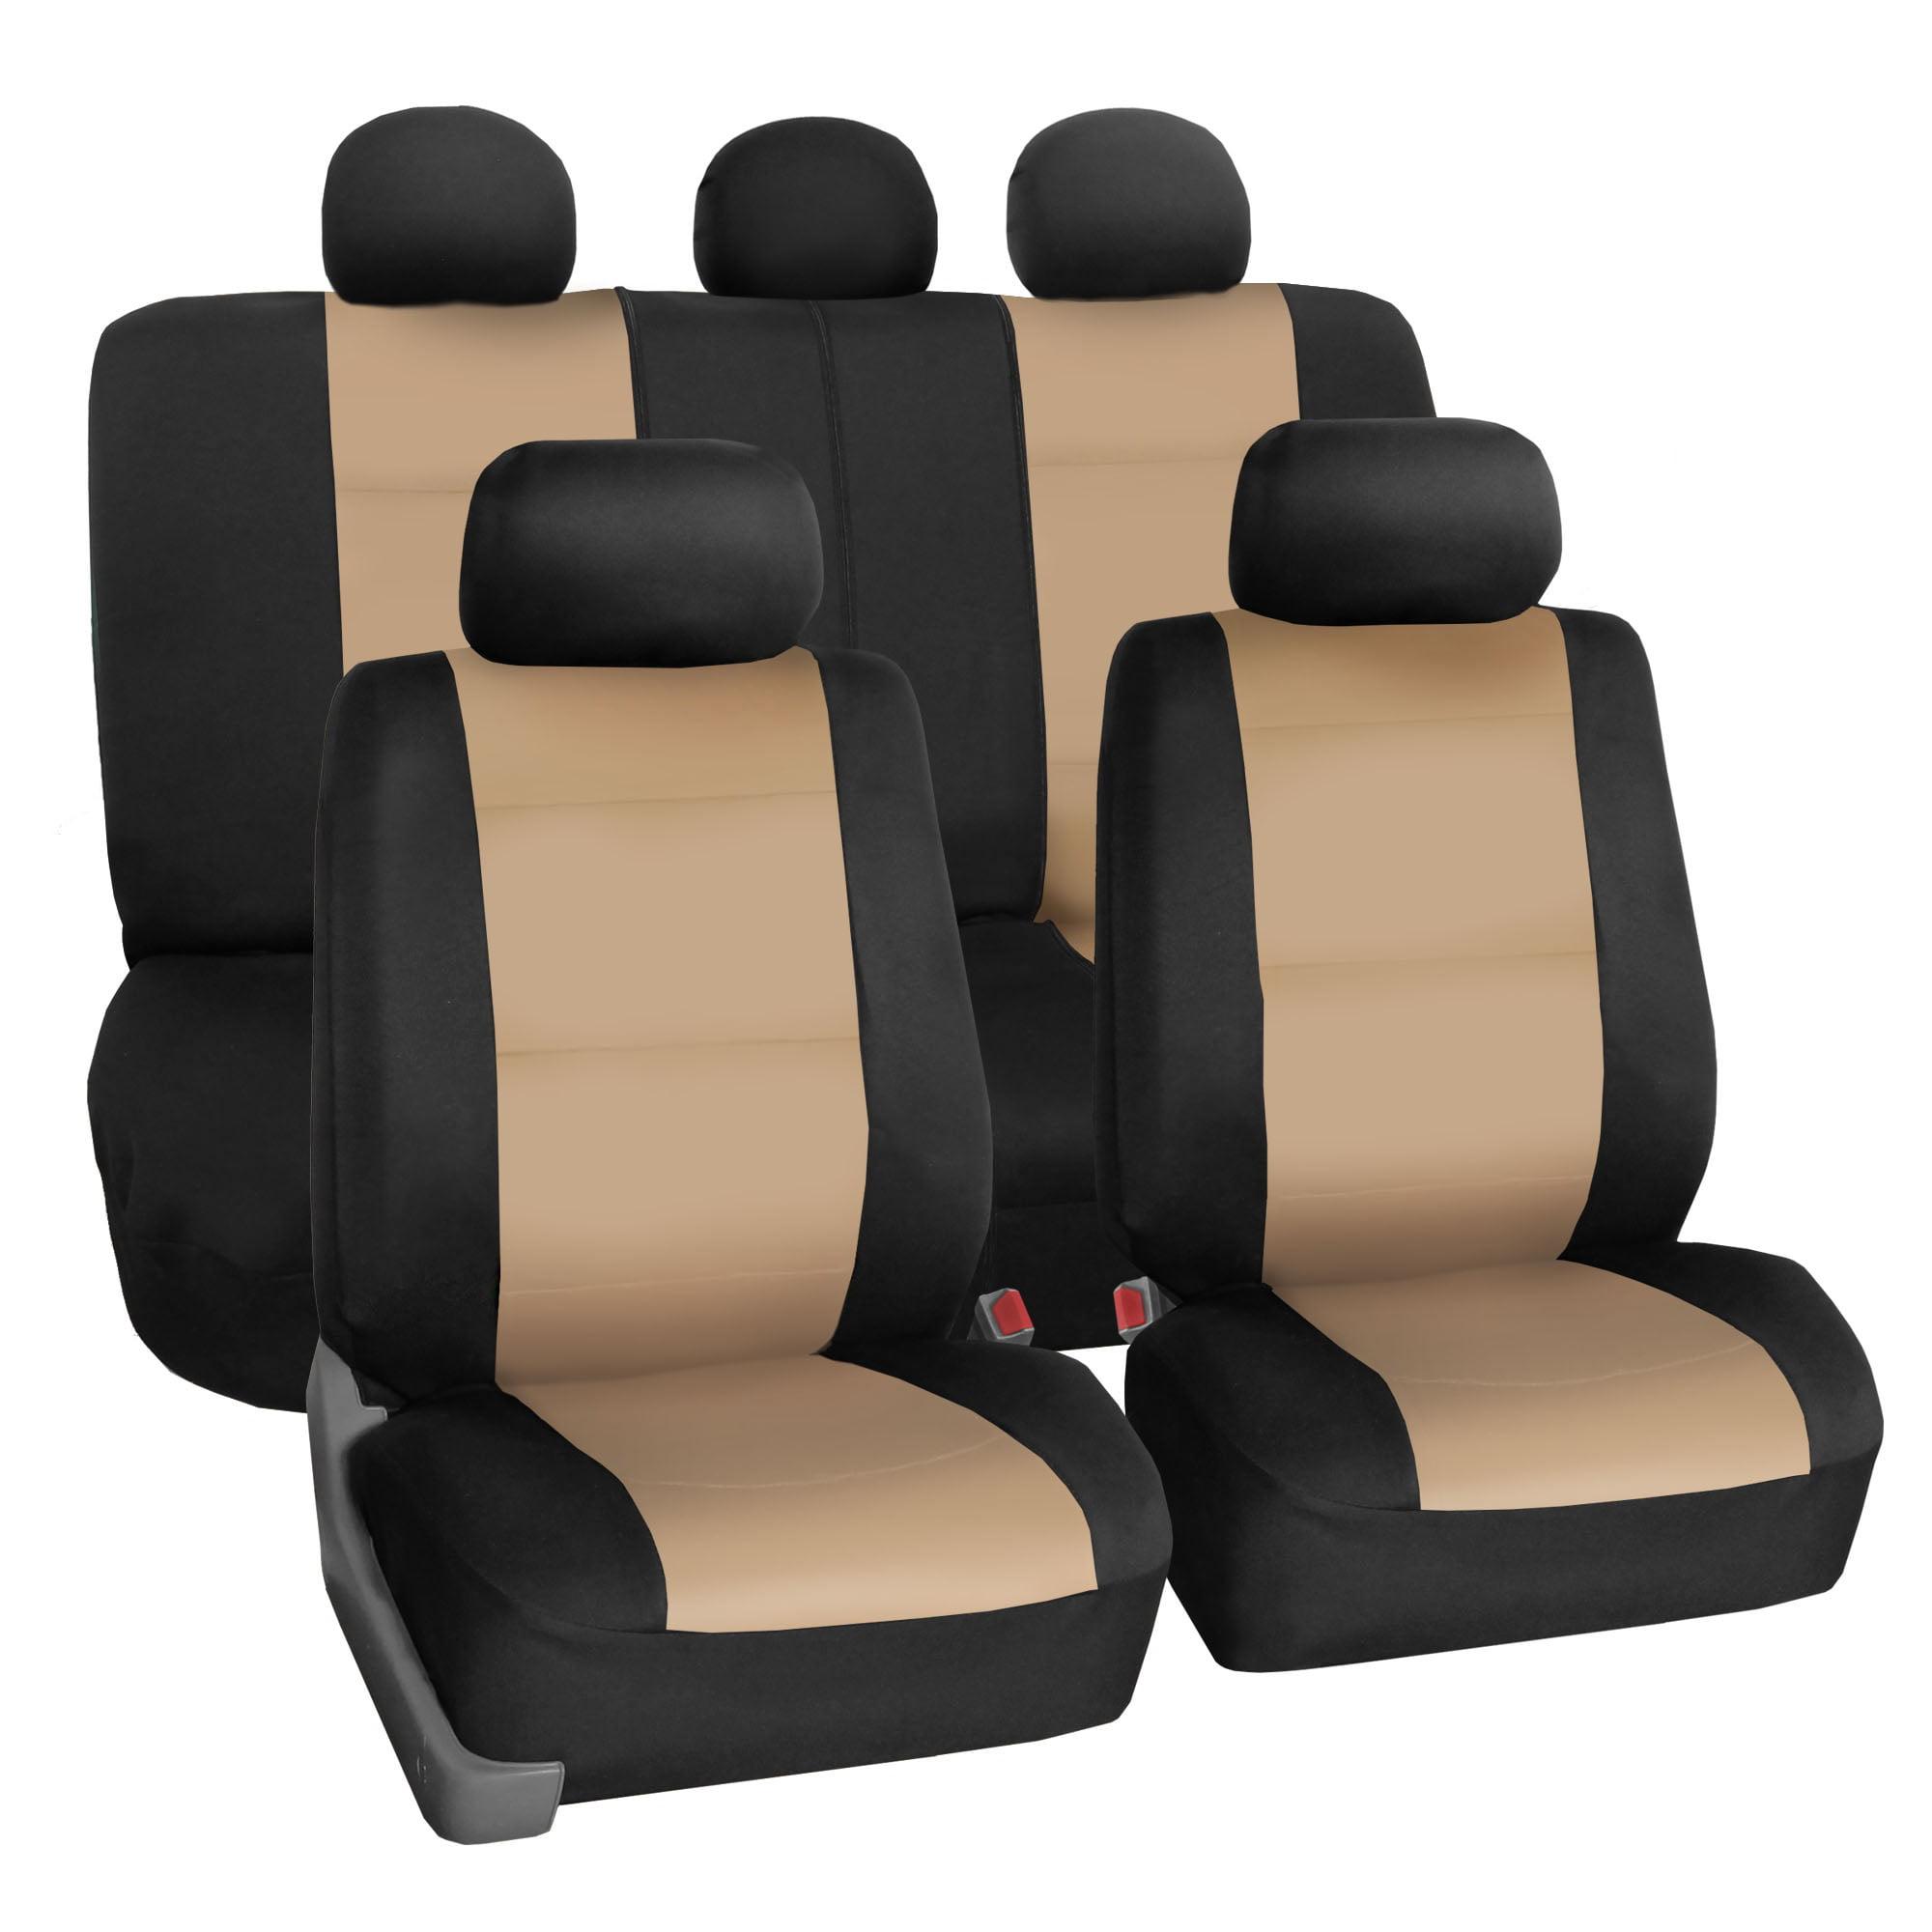 FH Group Neoprene Waterproof Full Set Car Seat Covers Airbag Ready & Split Bench Function, Beige